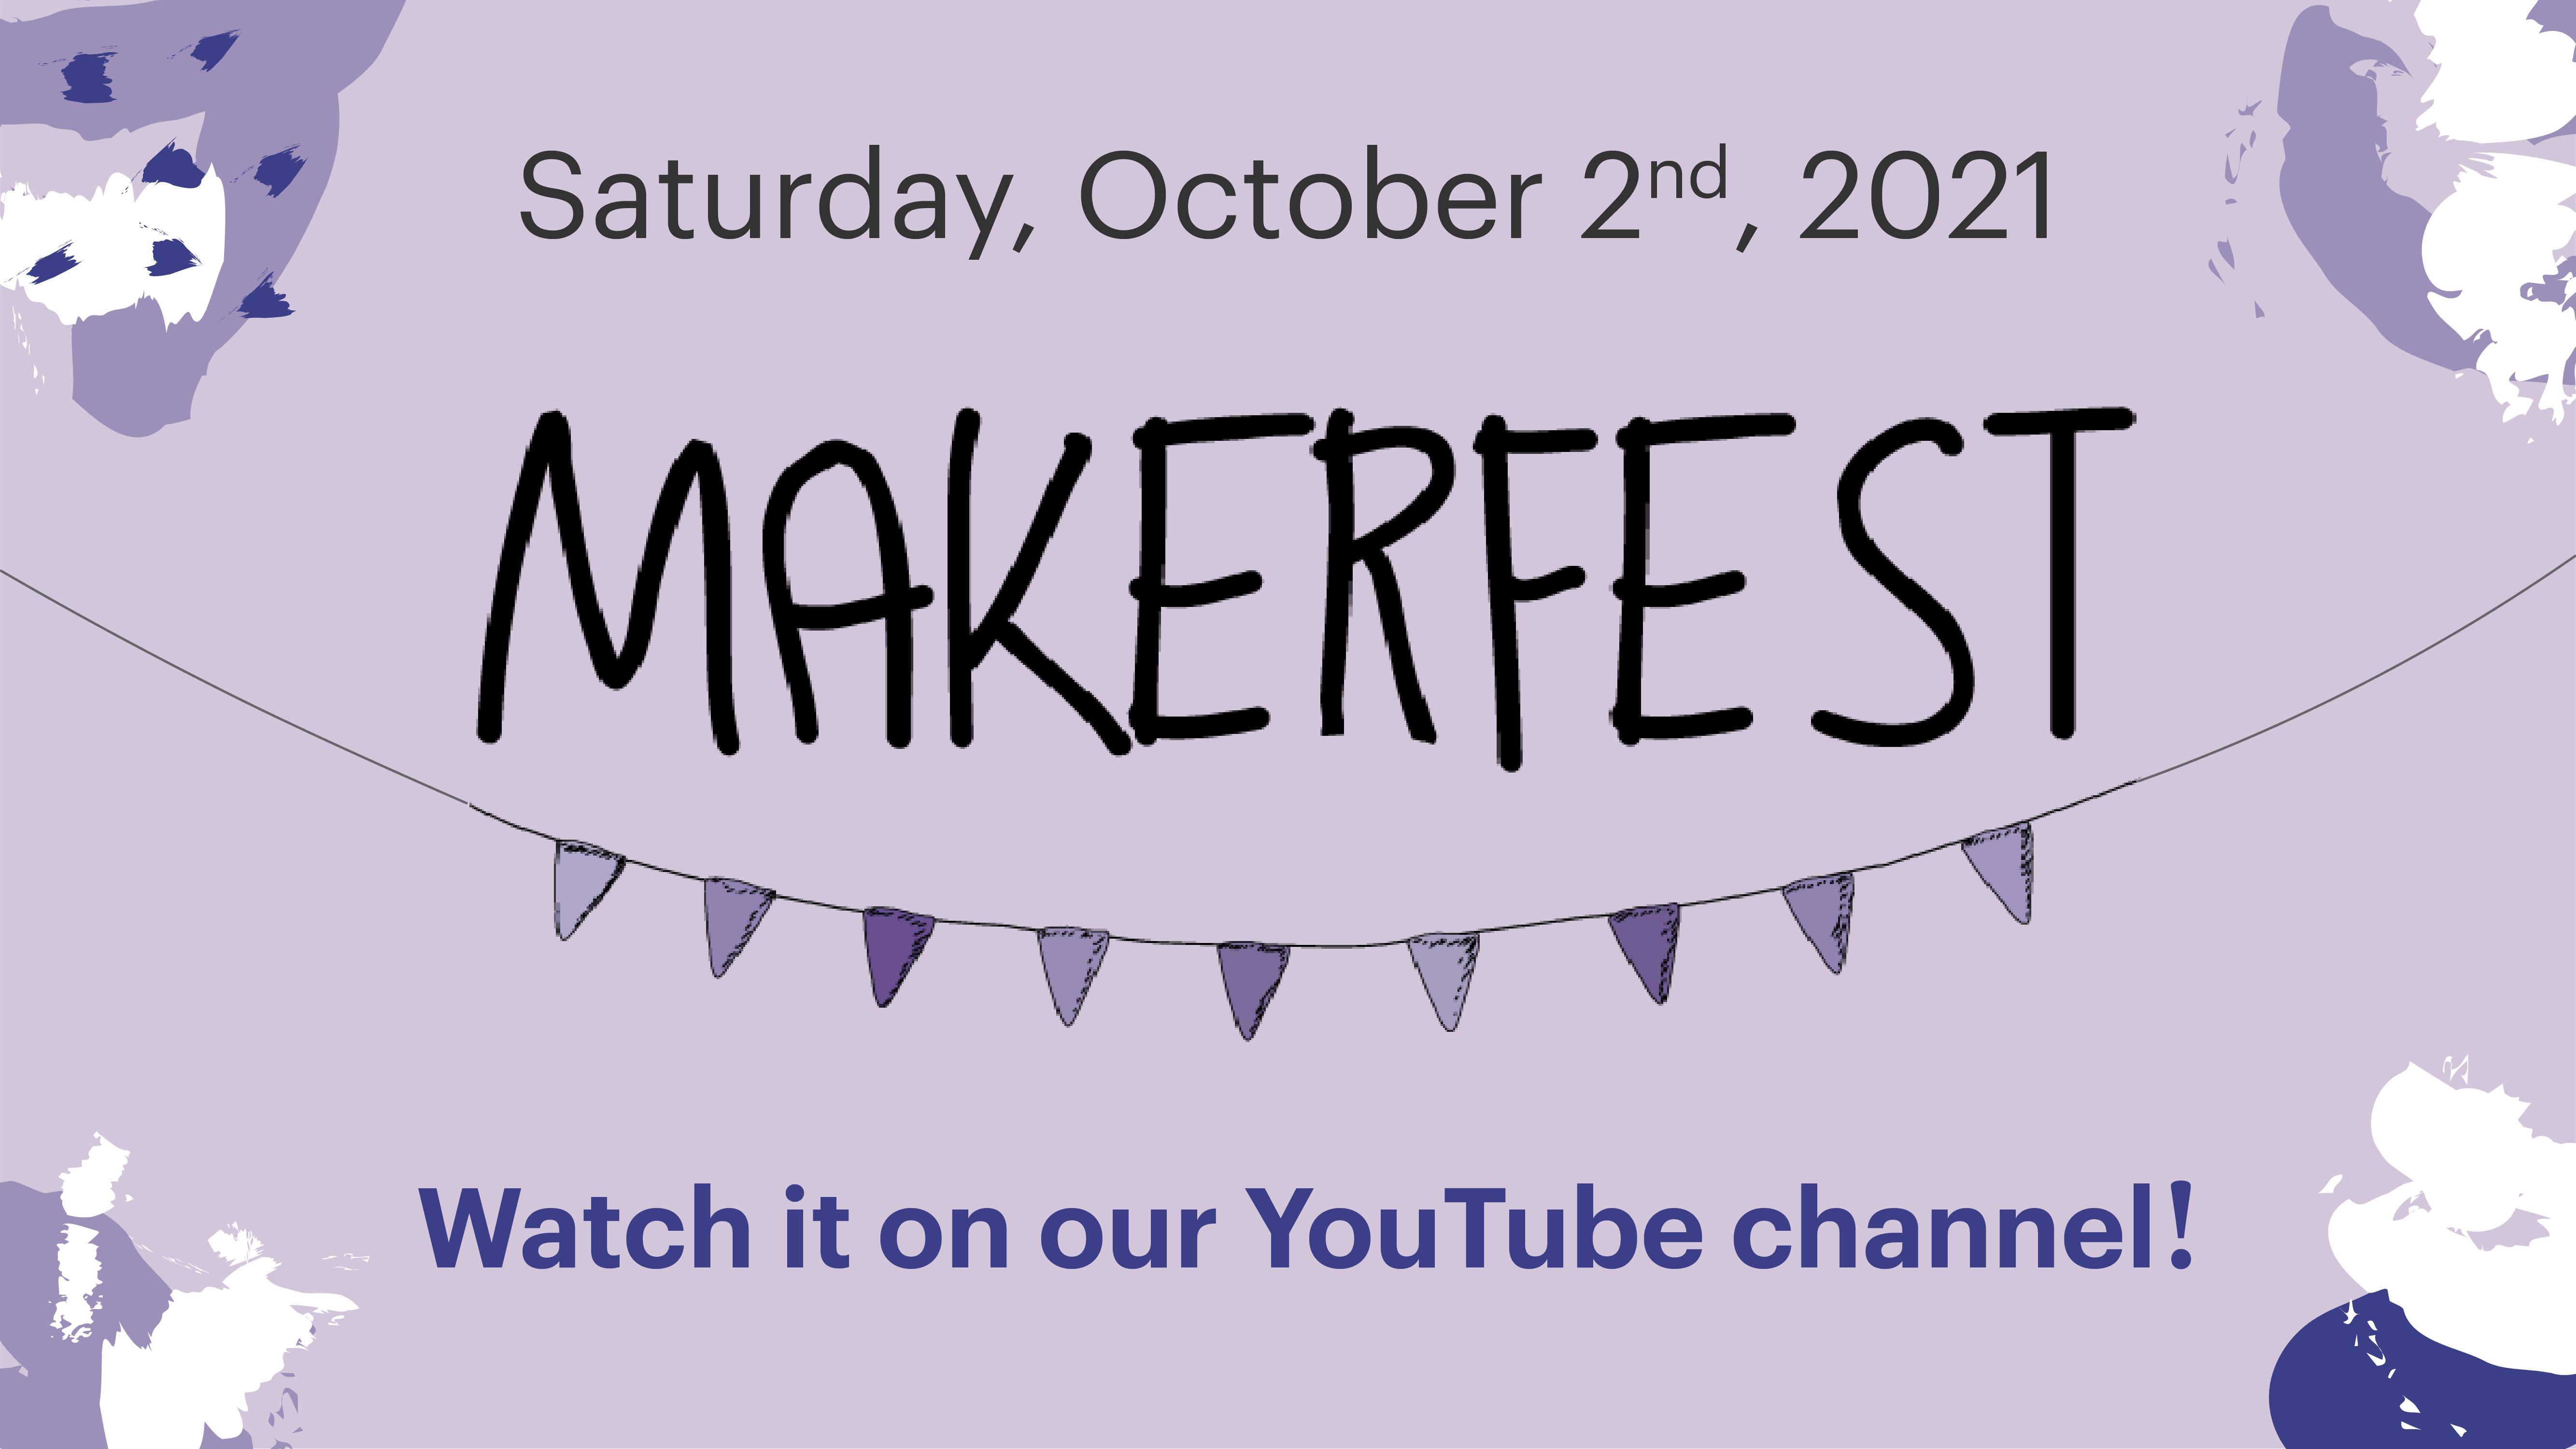 Link to MakerFest youtube playlist